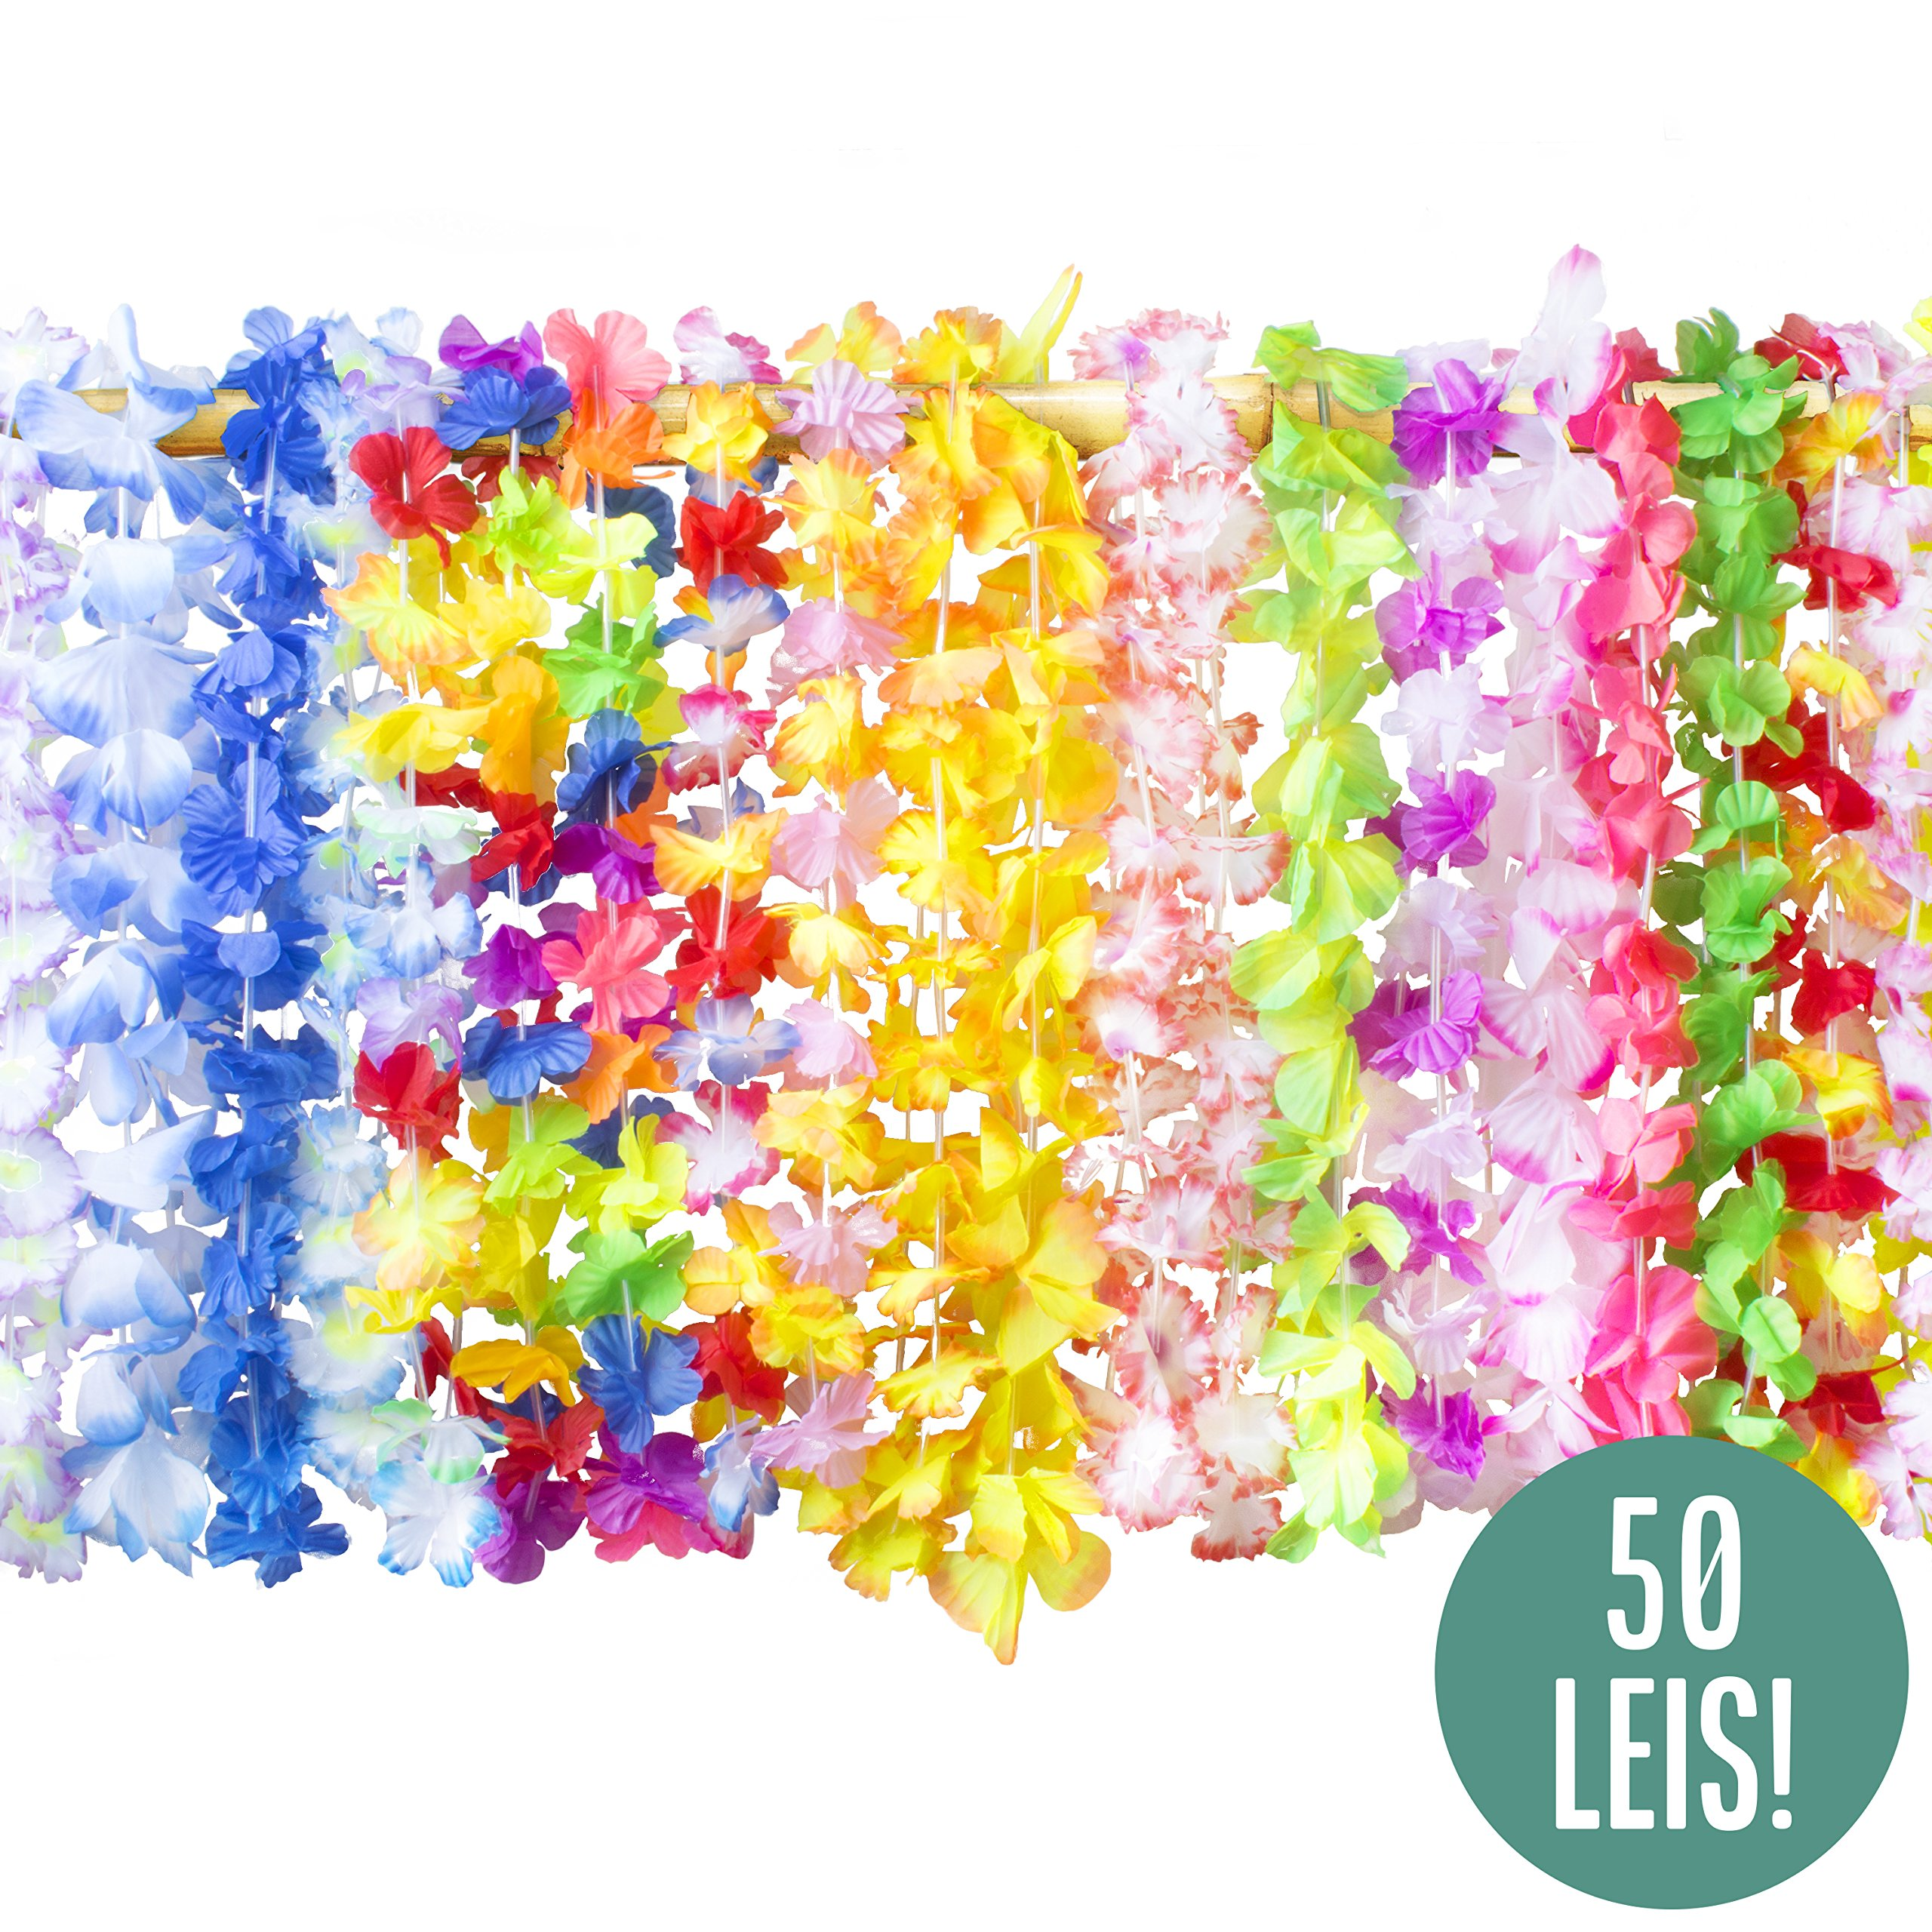 Hawaiian Leis Bulk Party Favors - 50 Hawaiian Flower Leis Bulk Pack for Luau Leis and Hawaiian Leis for Kids + Flower Leis Necklaces Party Favors